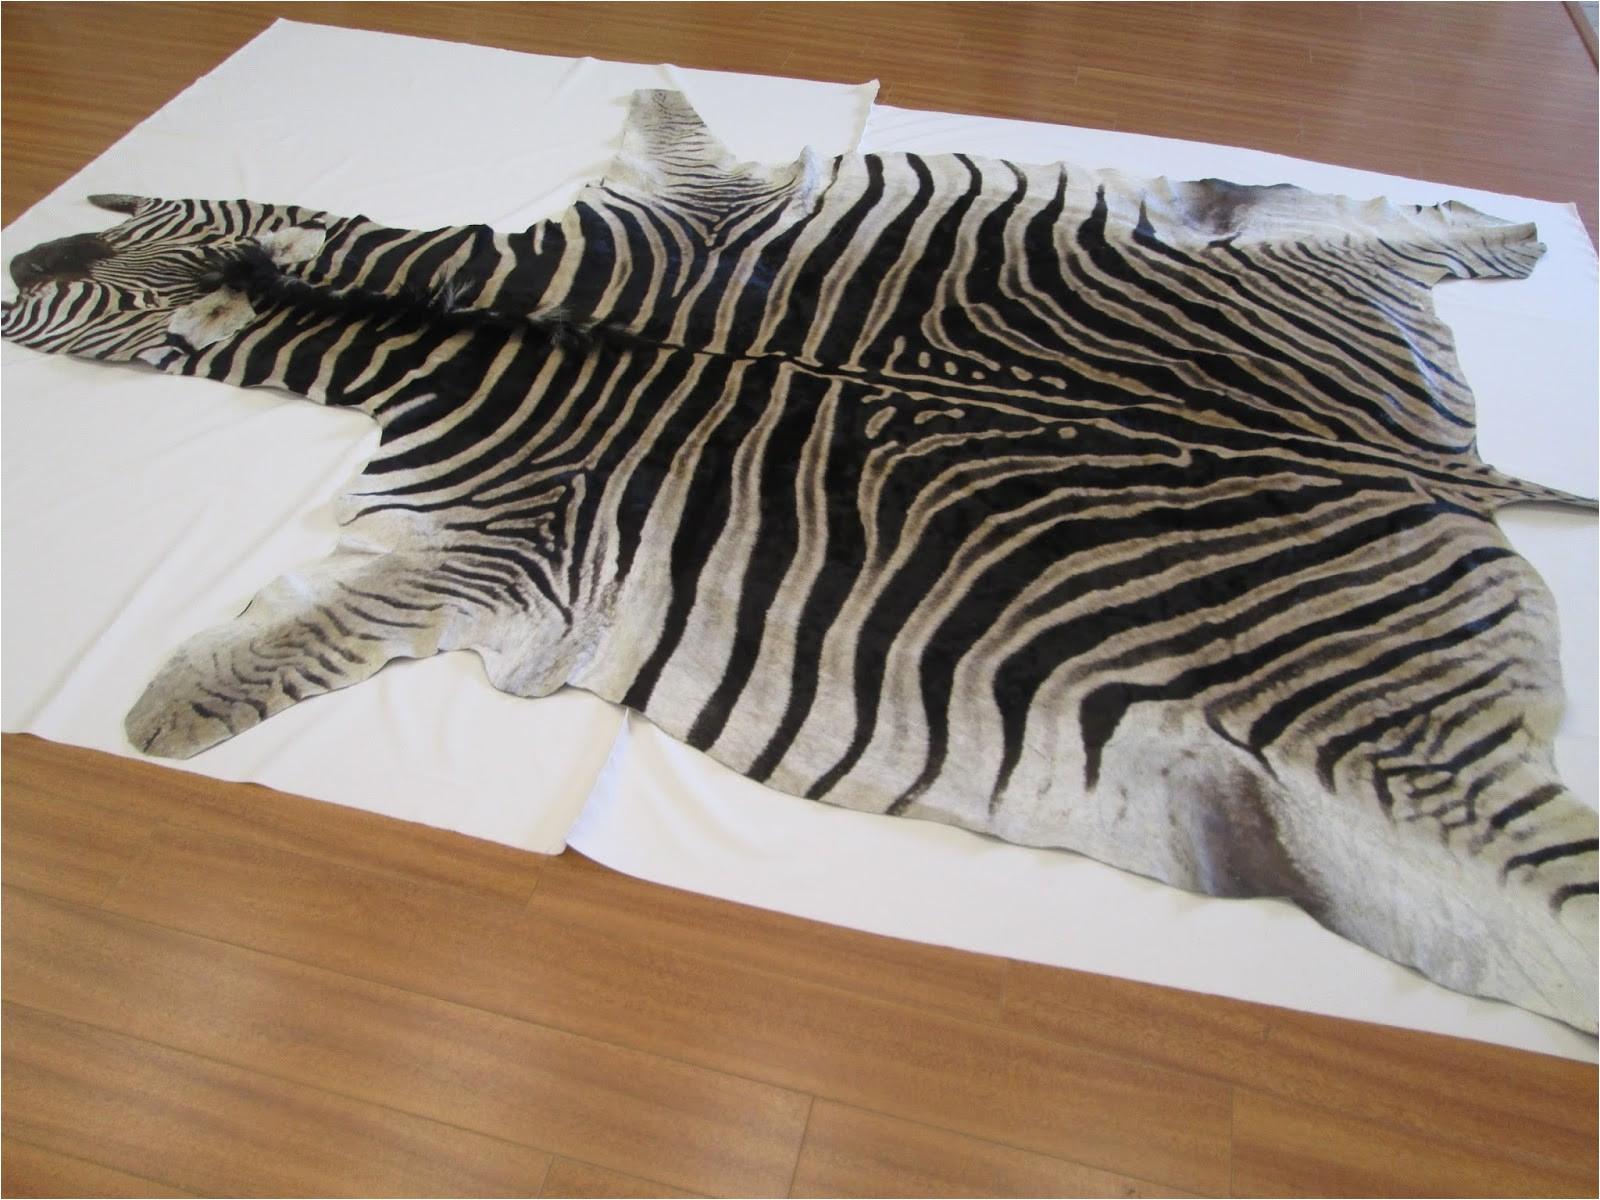 Real Zebra Skin Rug Uk 50 Elegant Cowhide Pics Photos Home Improvement